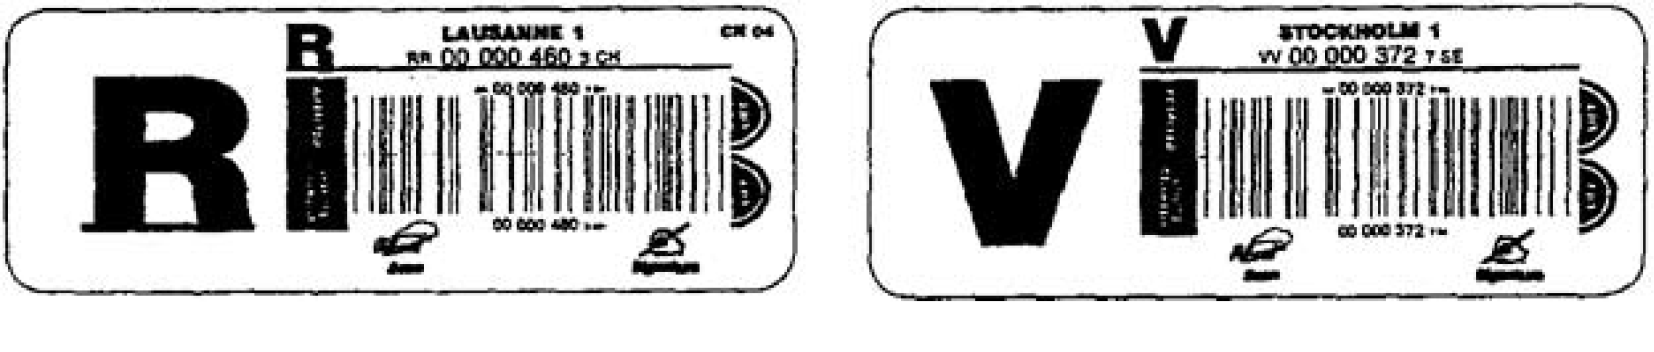 BOE es - Documento BOE-A-2009-3499